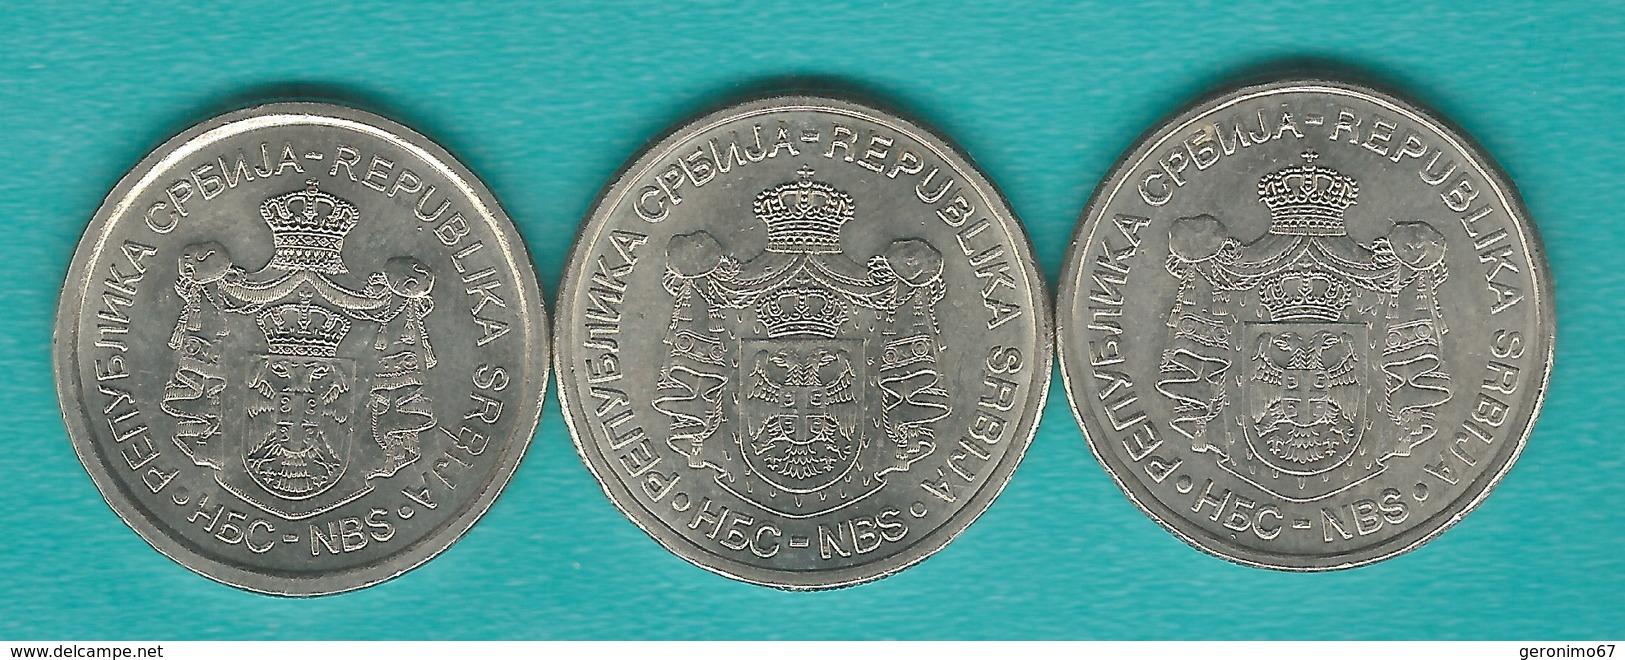 5 Dinara - 2006 (KM40) 2011 (56) & 2013 (KM56a); 10 Dinara - 2005 (KM41) 2009 - Universiade (KM51) & 2012 (KM57) - Serbie